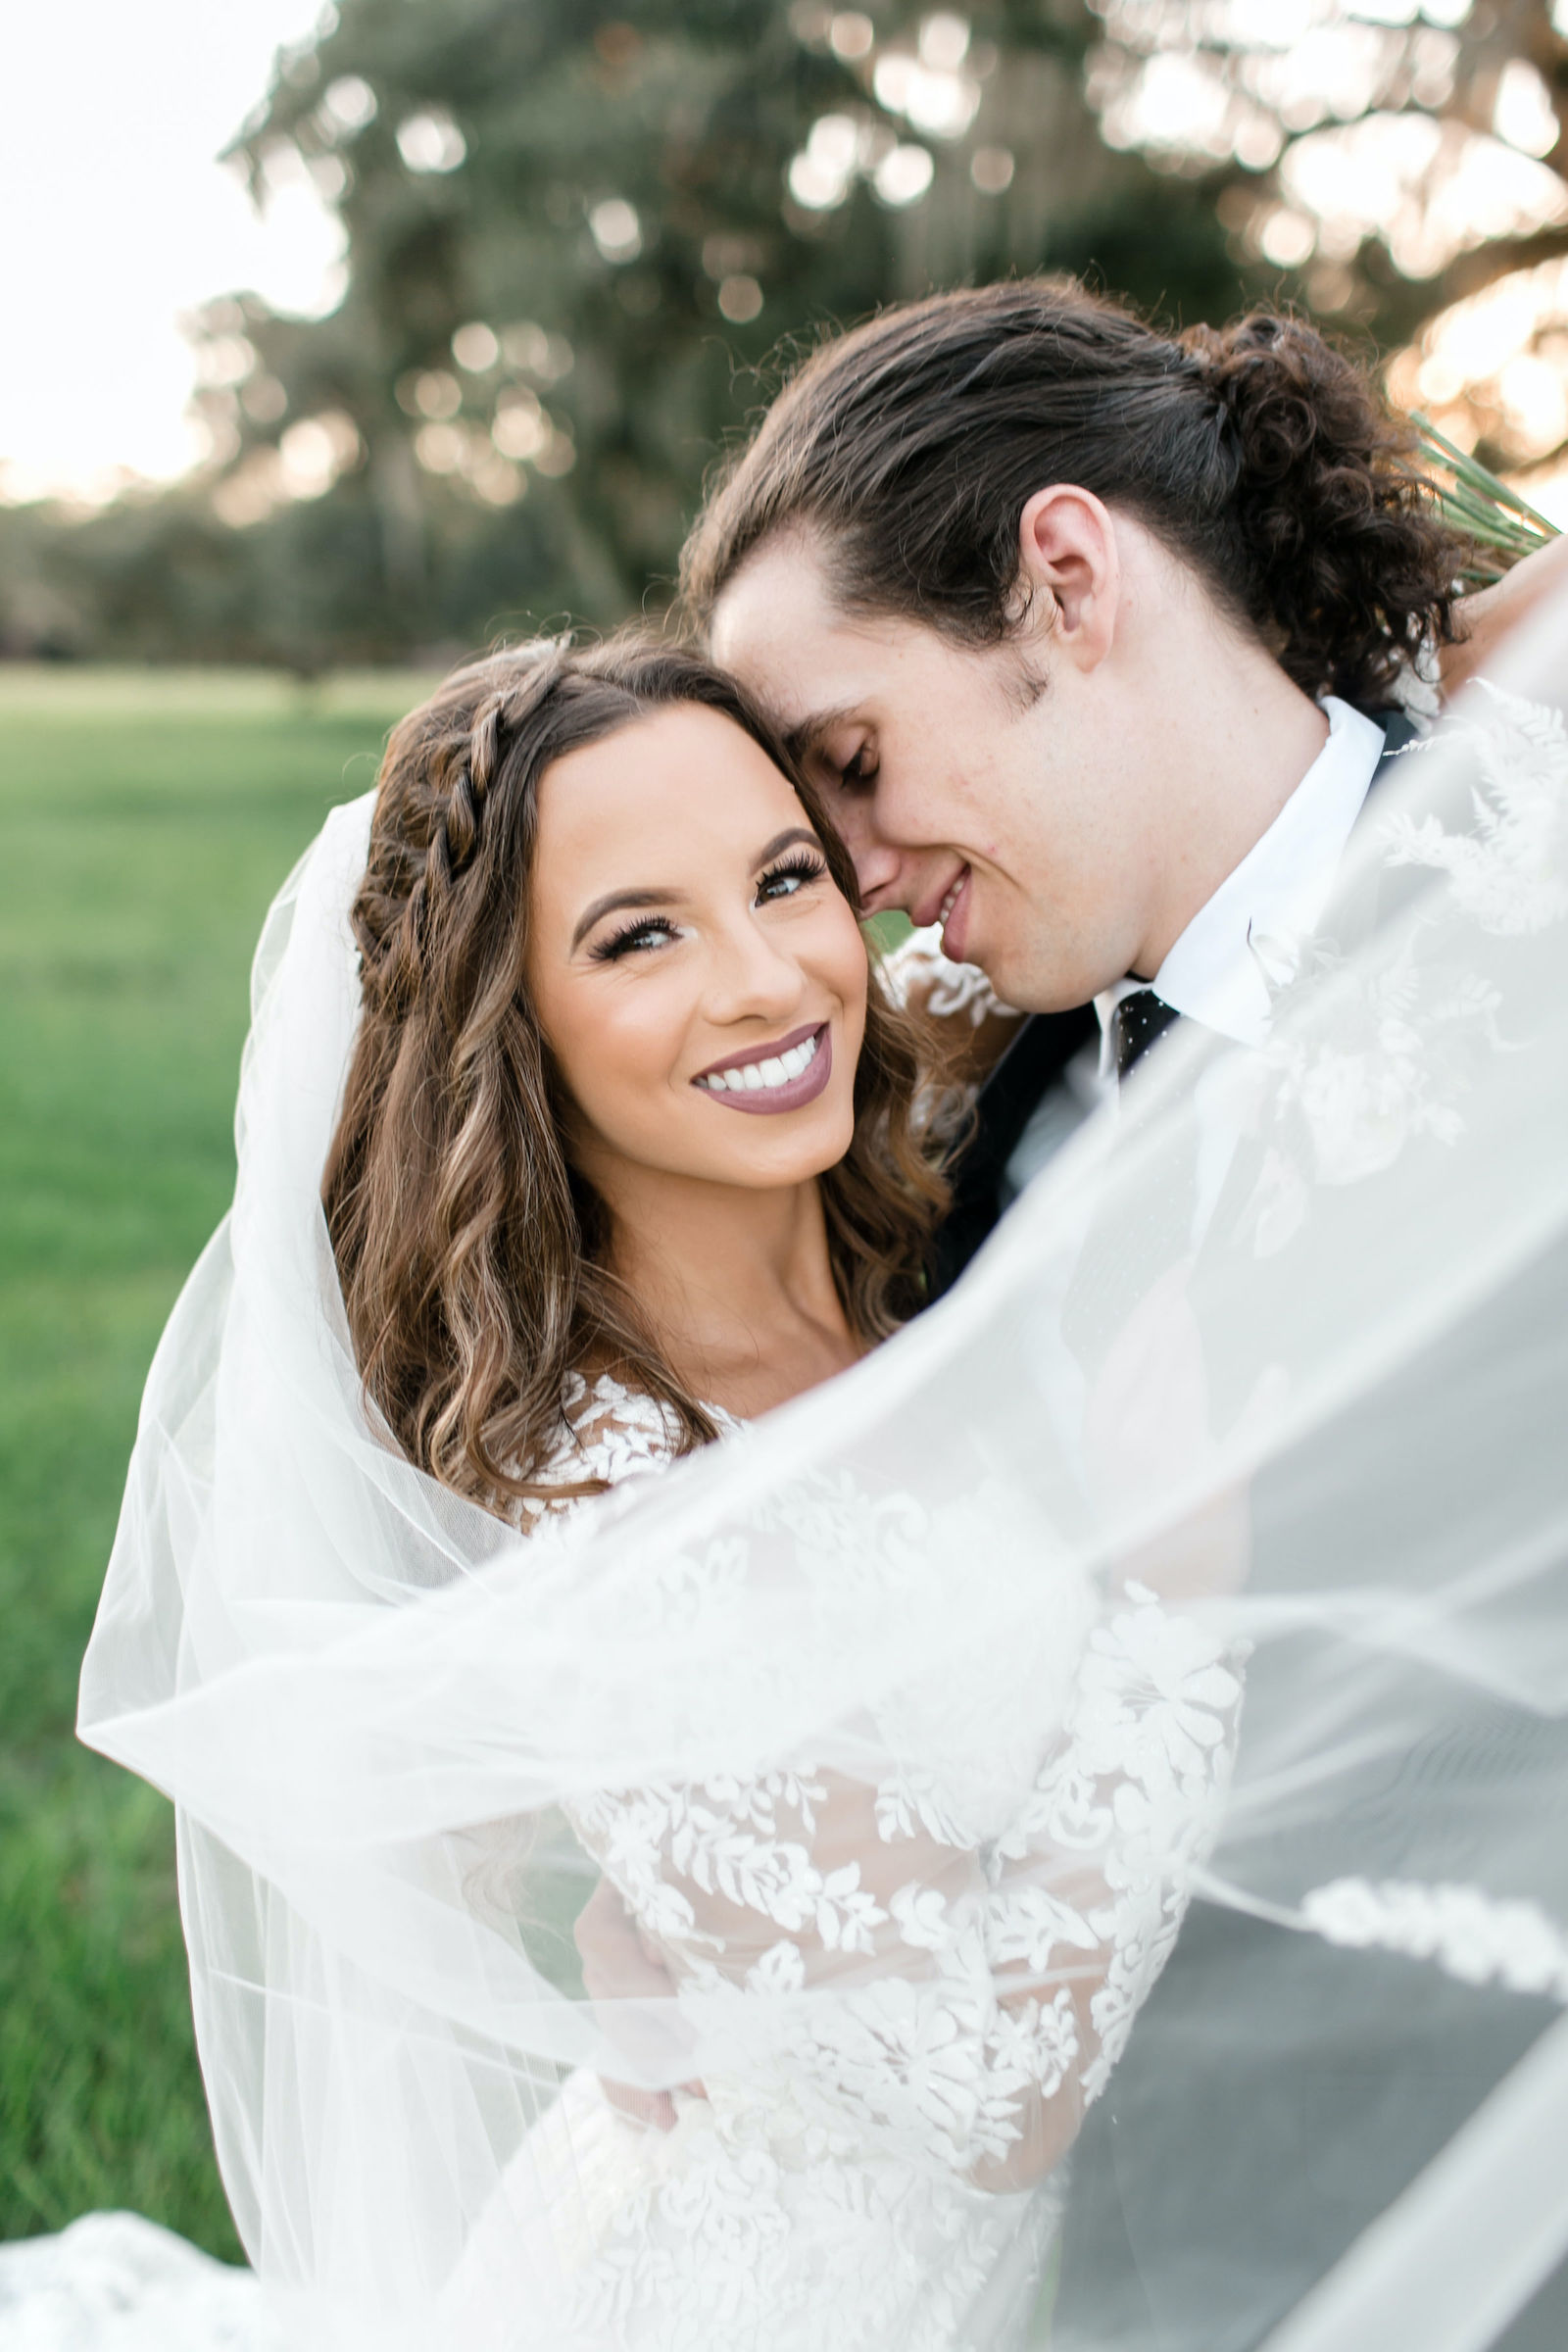 Outdoor Bride and Groom Portrait | Wedding Photography Veil Shot